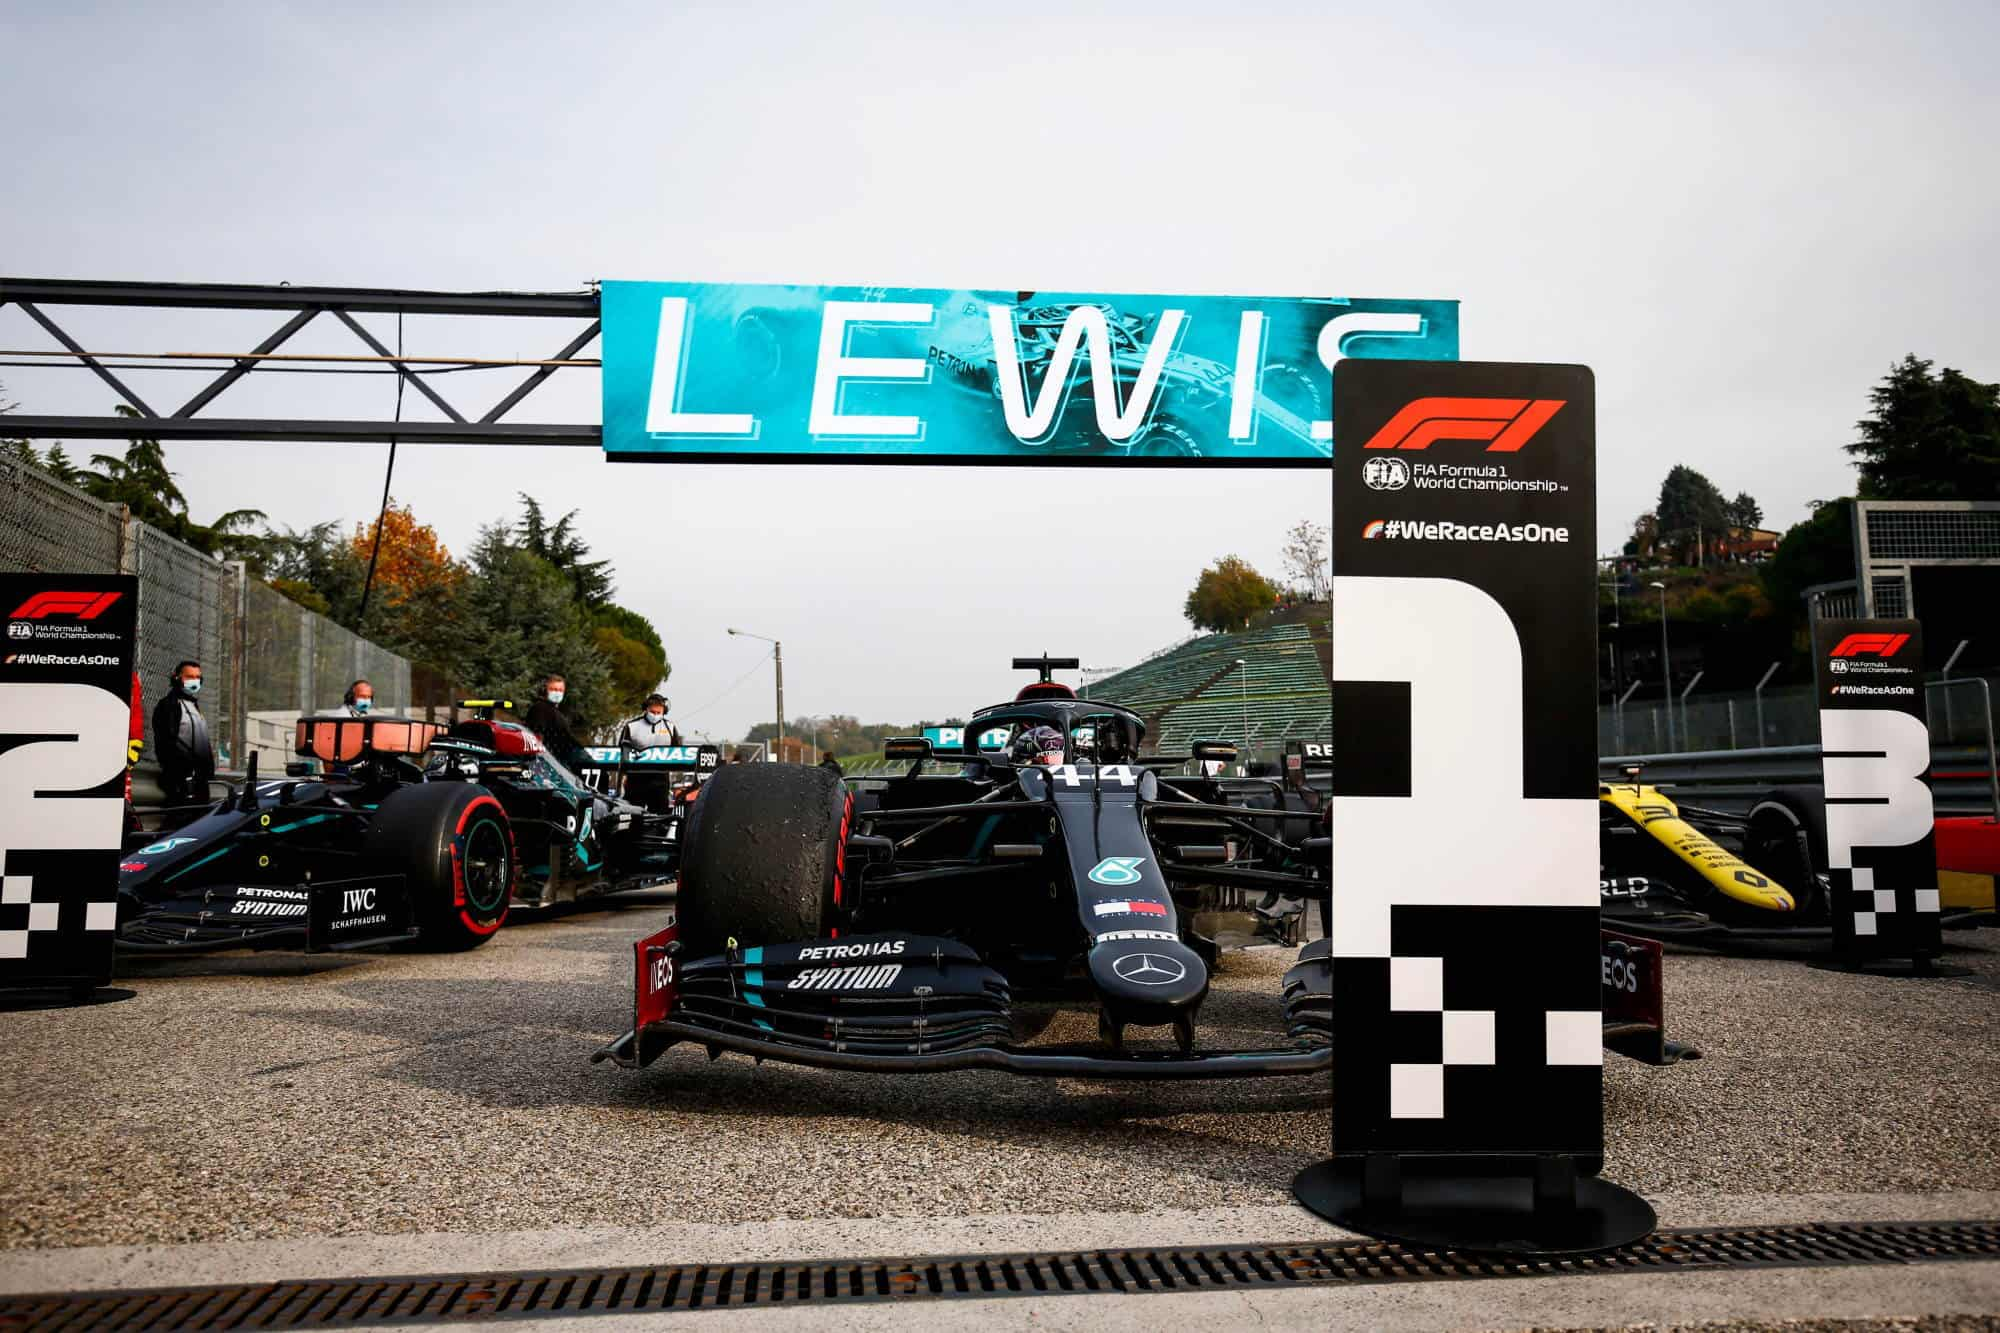 2020 Emilia Romagna Imola Hamilton and Bottas Mercedes after the race Photo Daimler Mercedes AMG Twitter